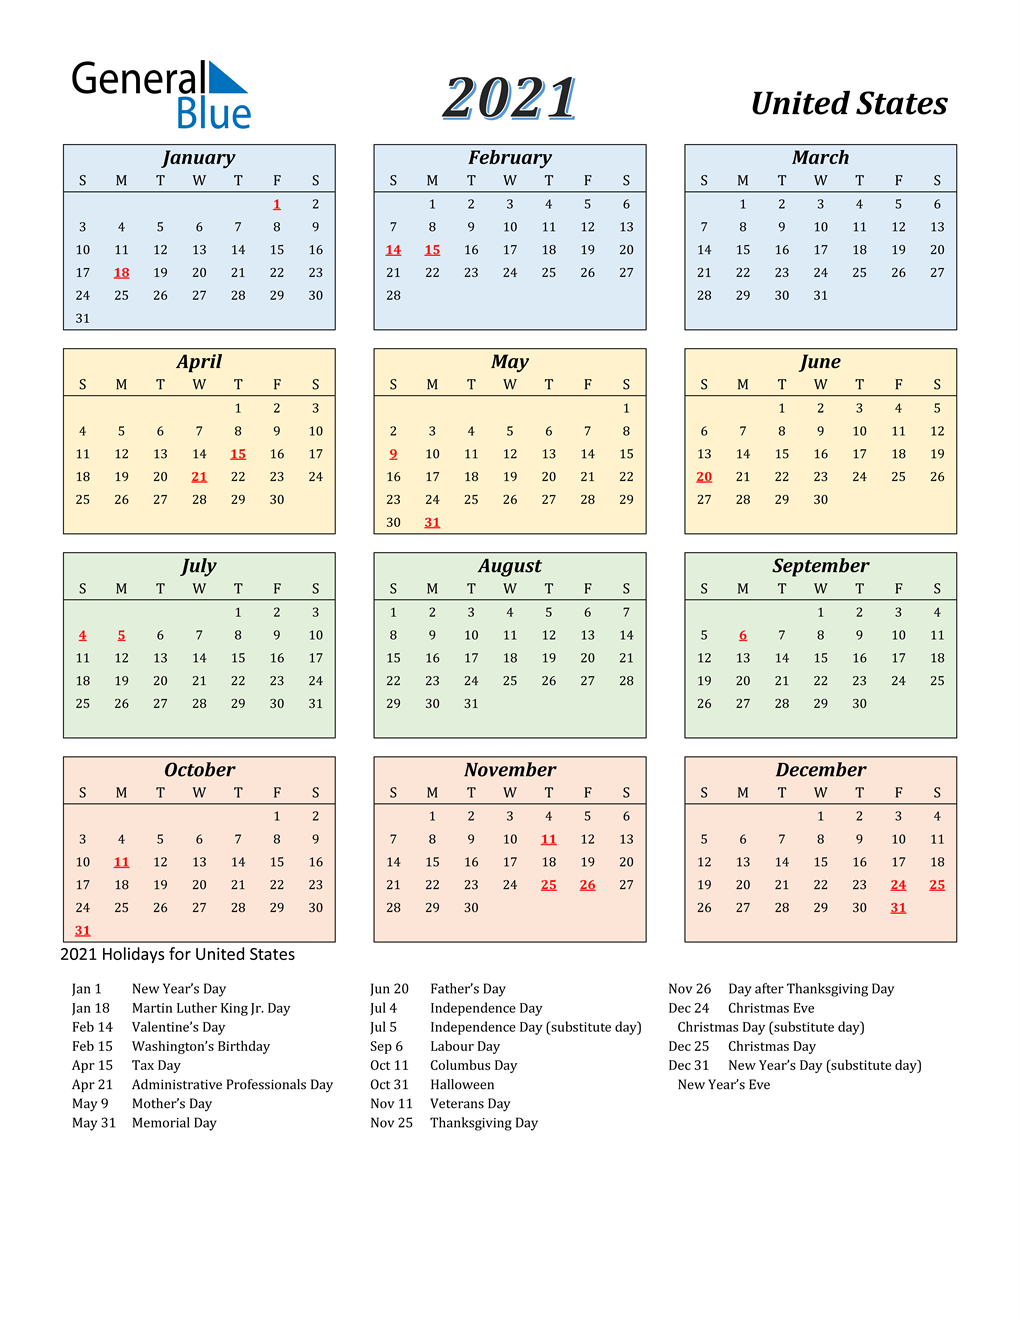 2022 Calendar With Holidays Usa.2021 United States Calendar With Holidays